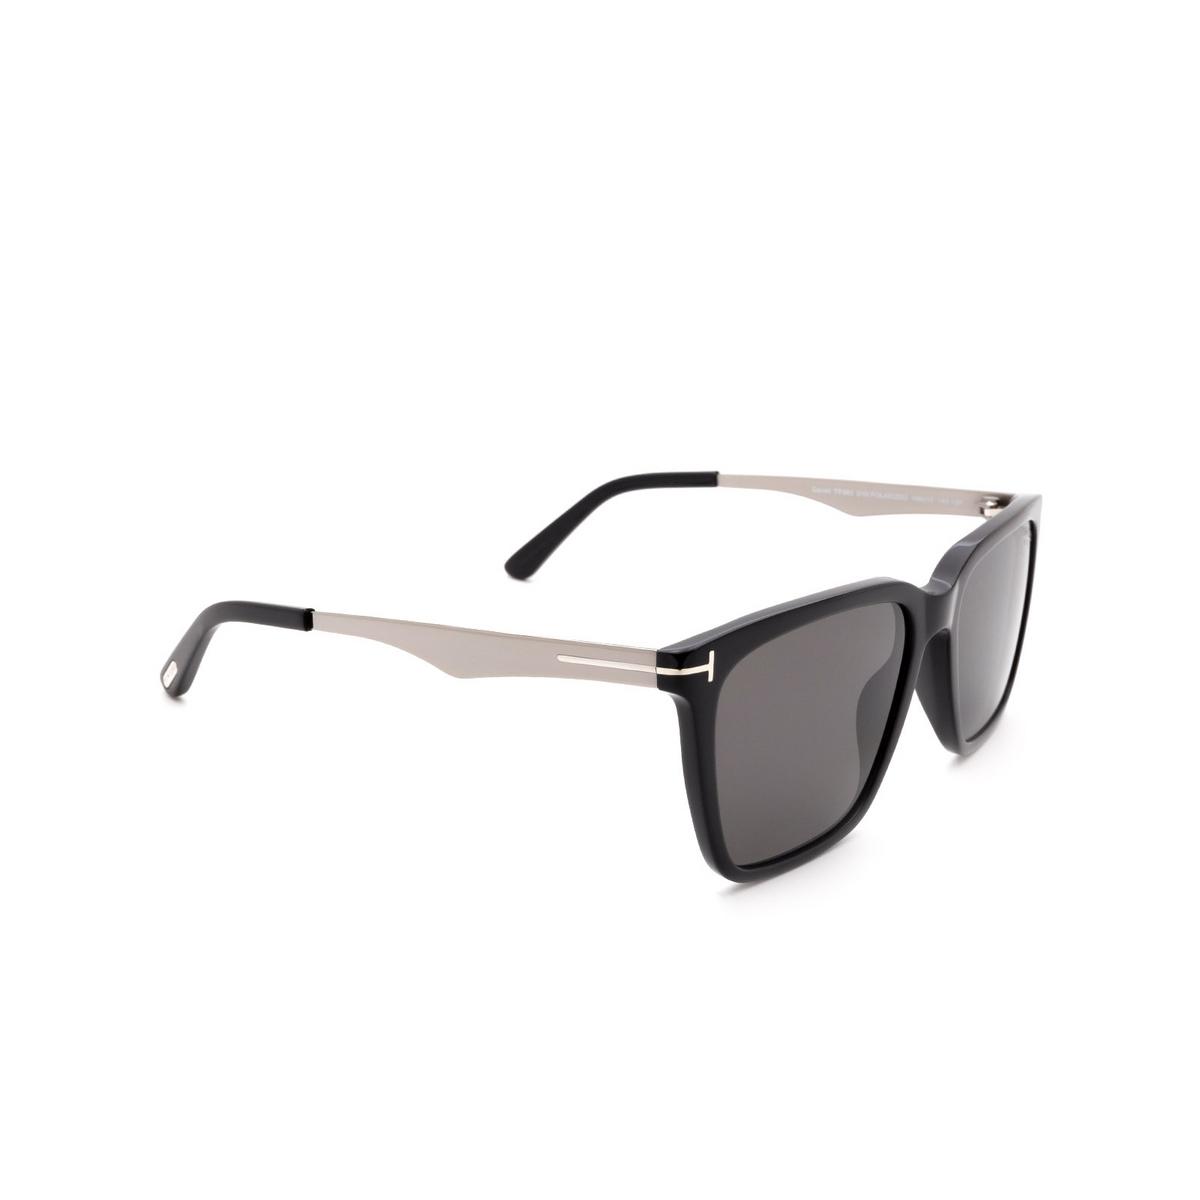 Tom Ford® Square Sunglasses: Garret FT0862 color Black 01D - three-quarters view.